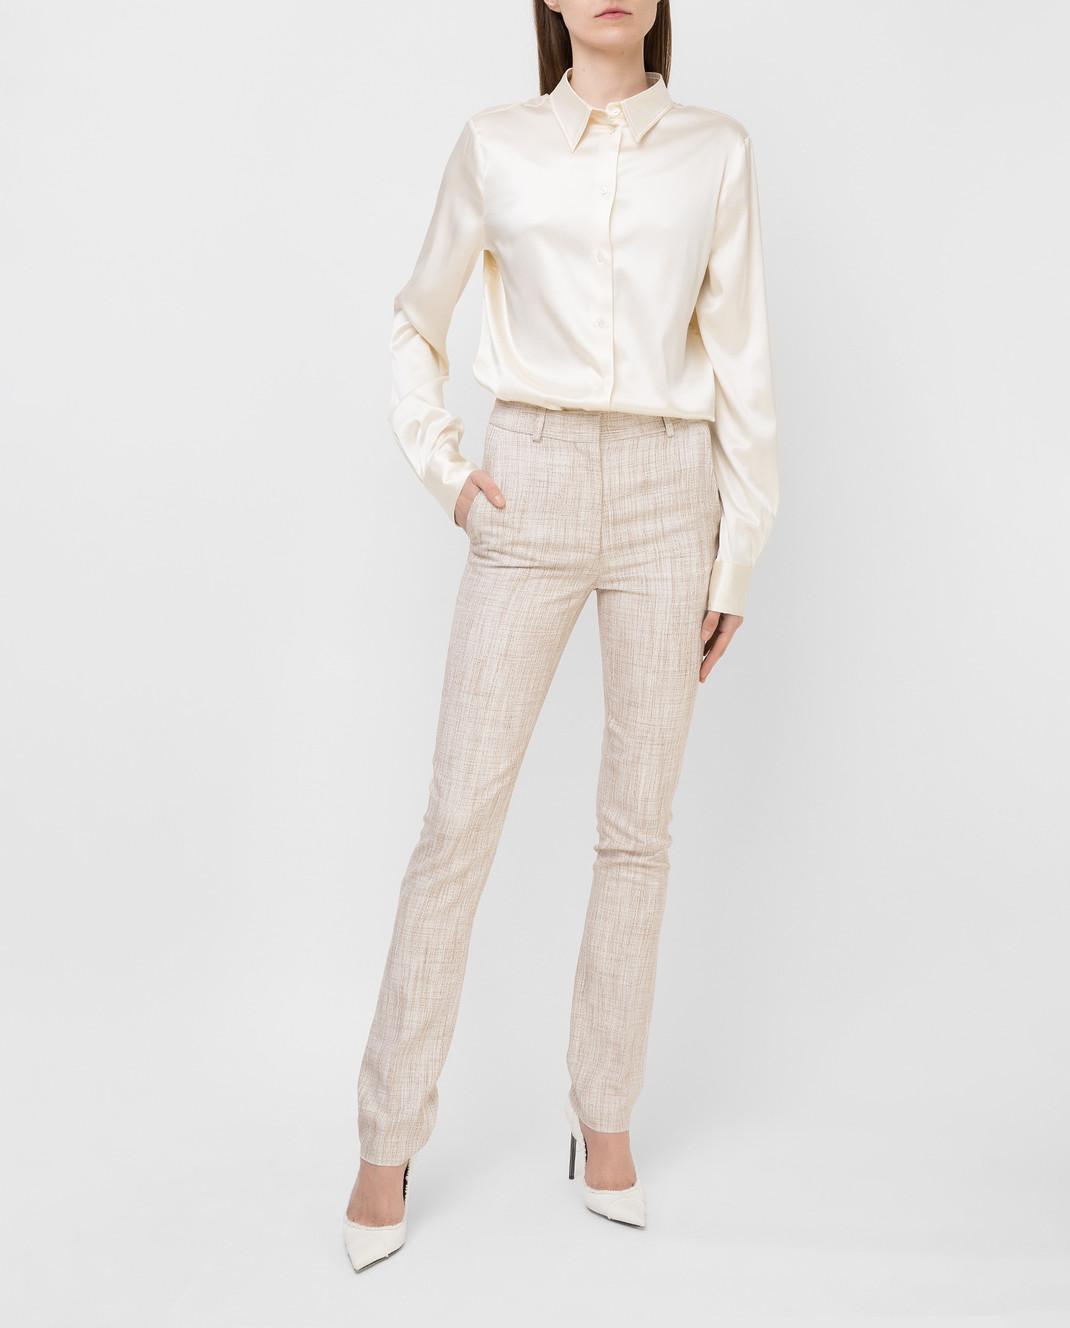 Victoria Beckham Бежевые брюки TRSLM2402 изображение 2